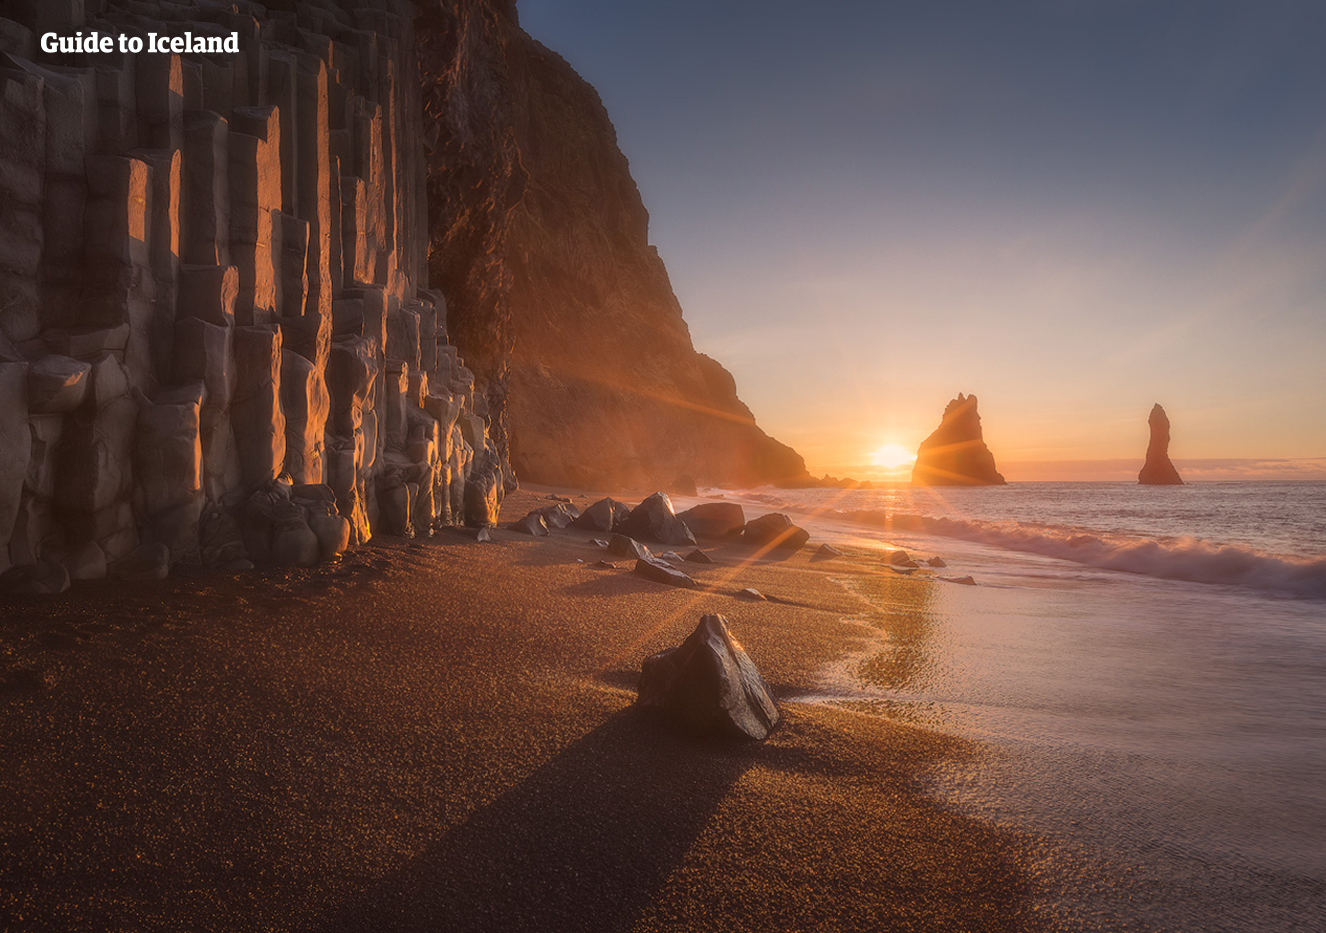 Закат на пляже Рейнисфьяра